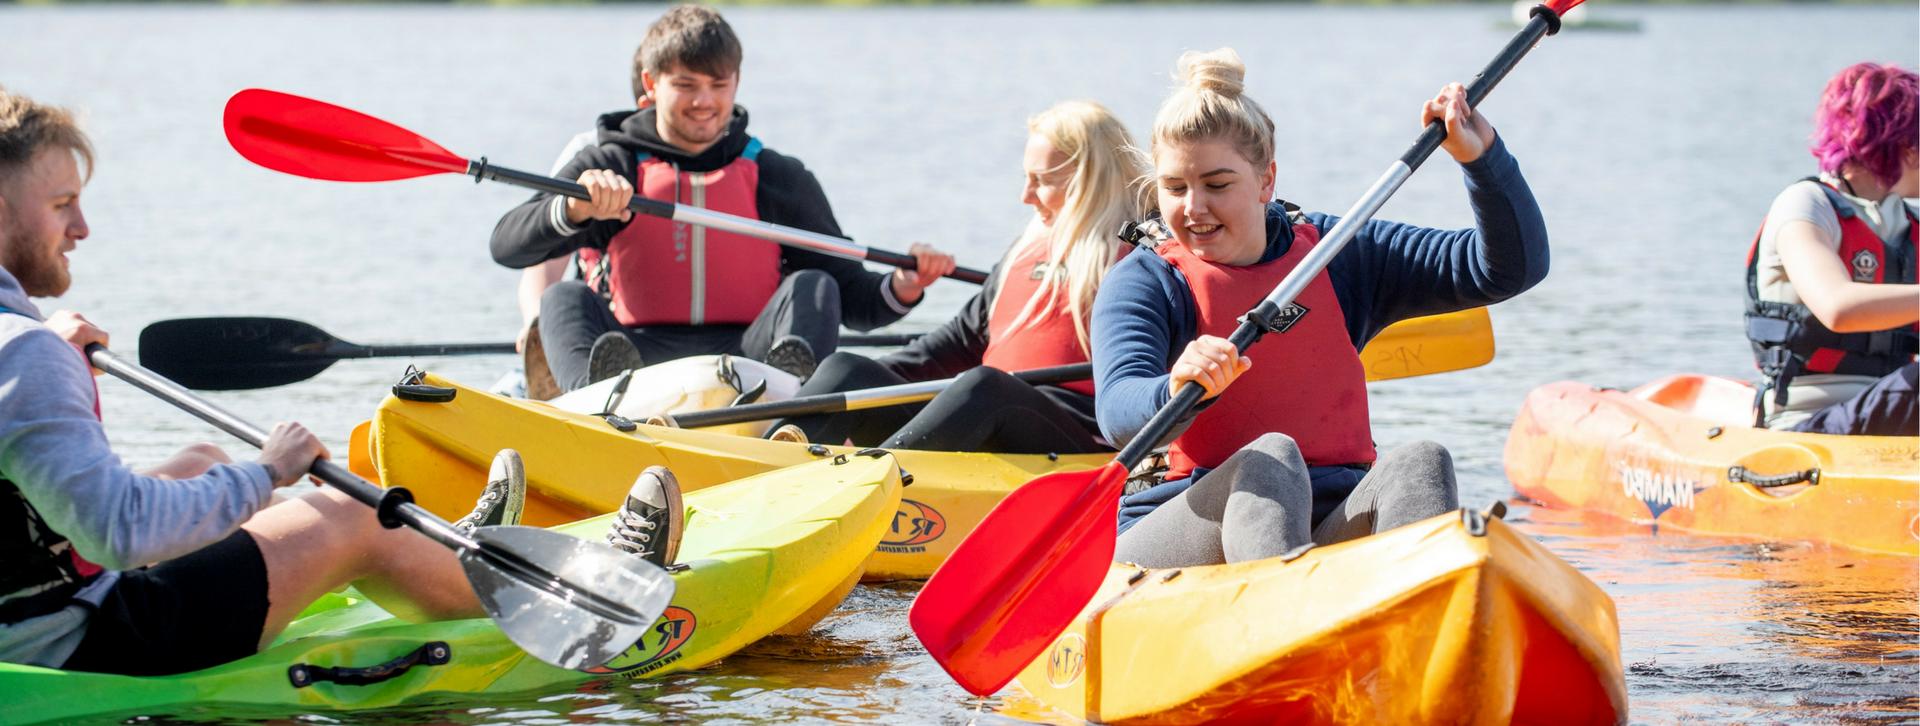 Tarmac team canoeing